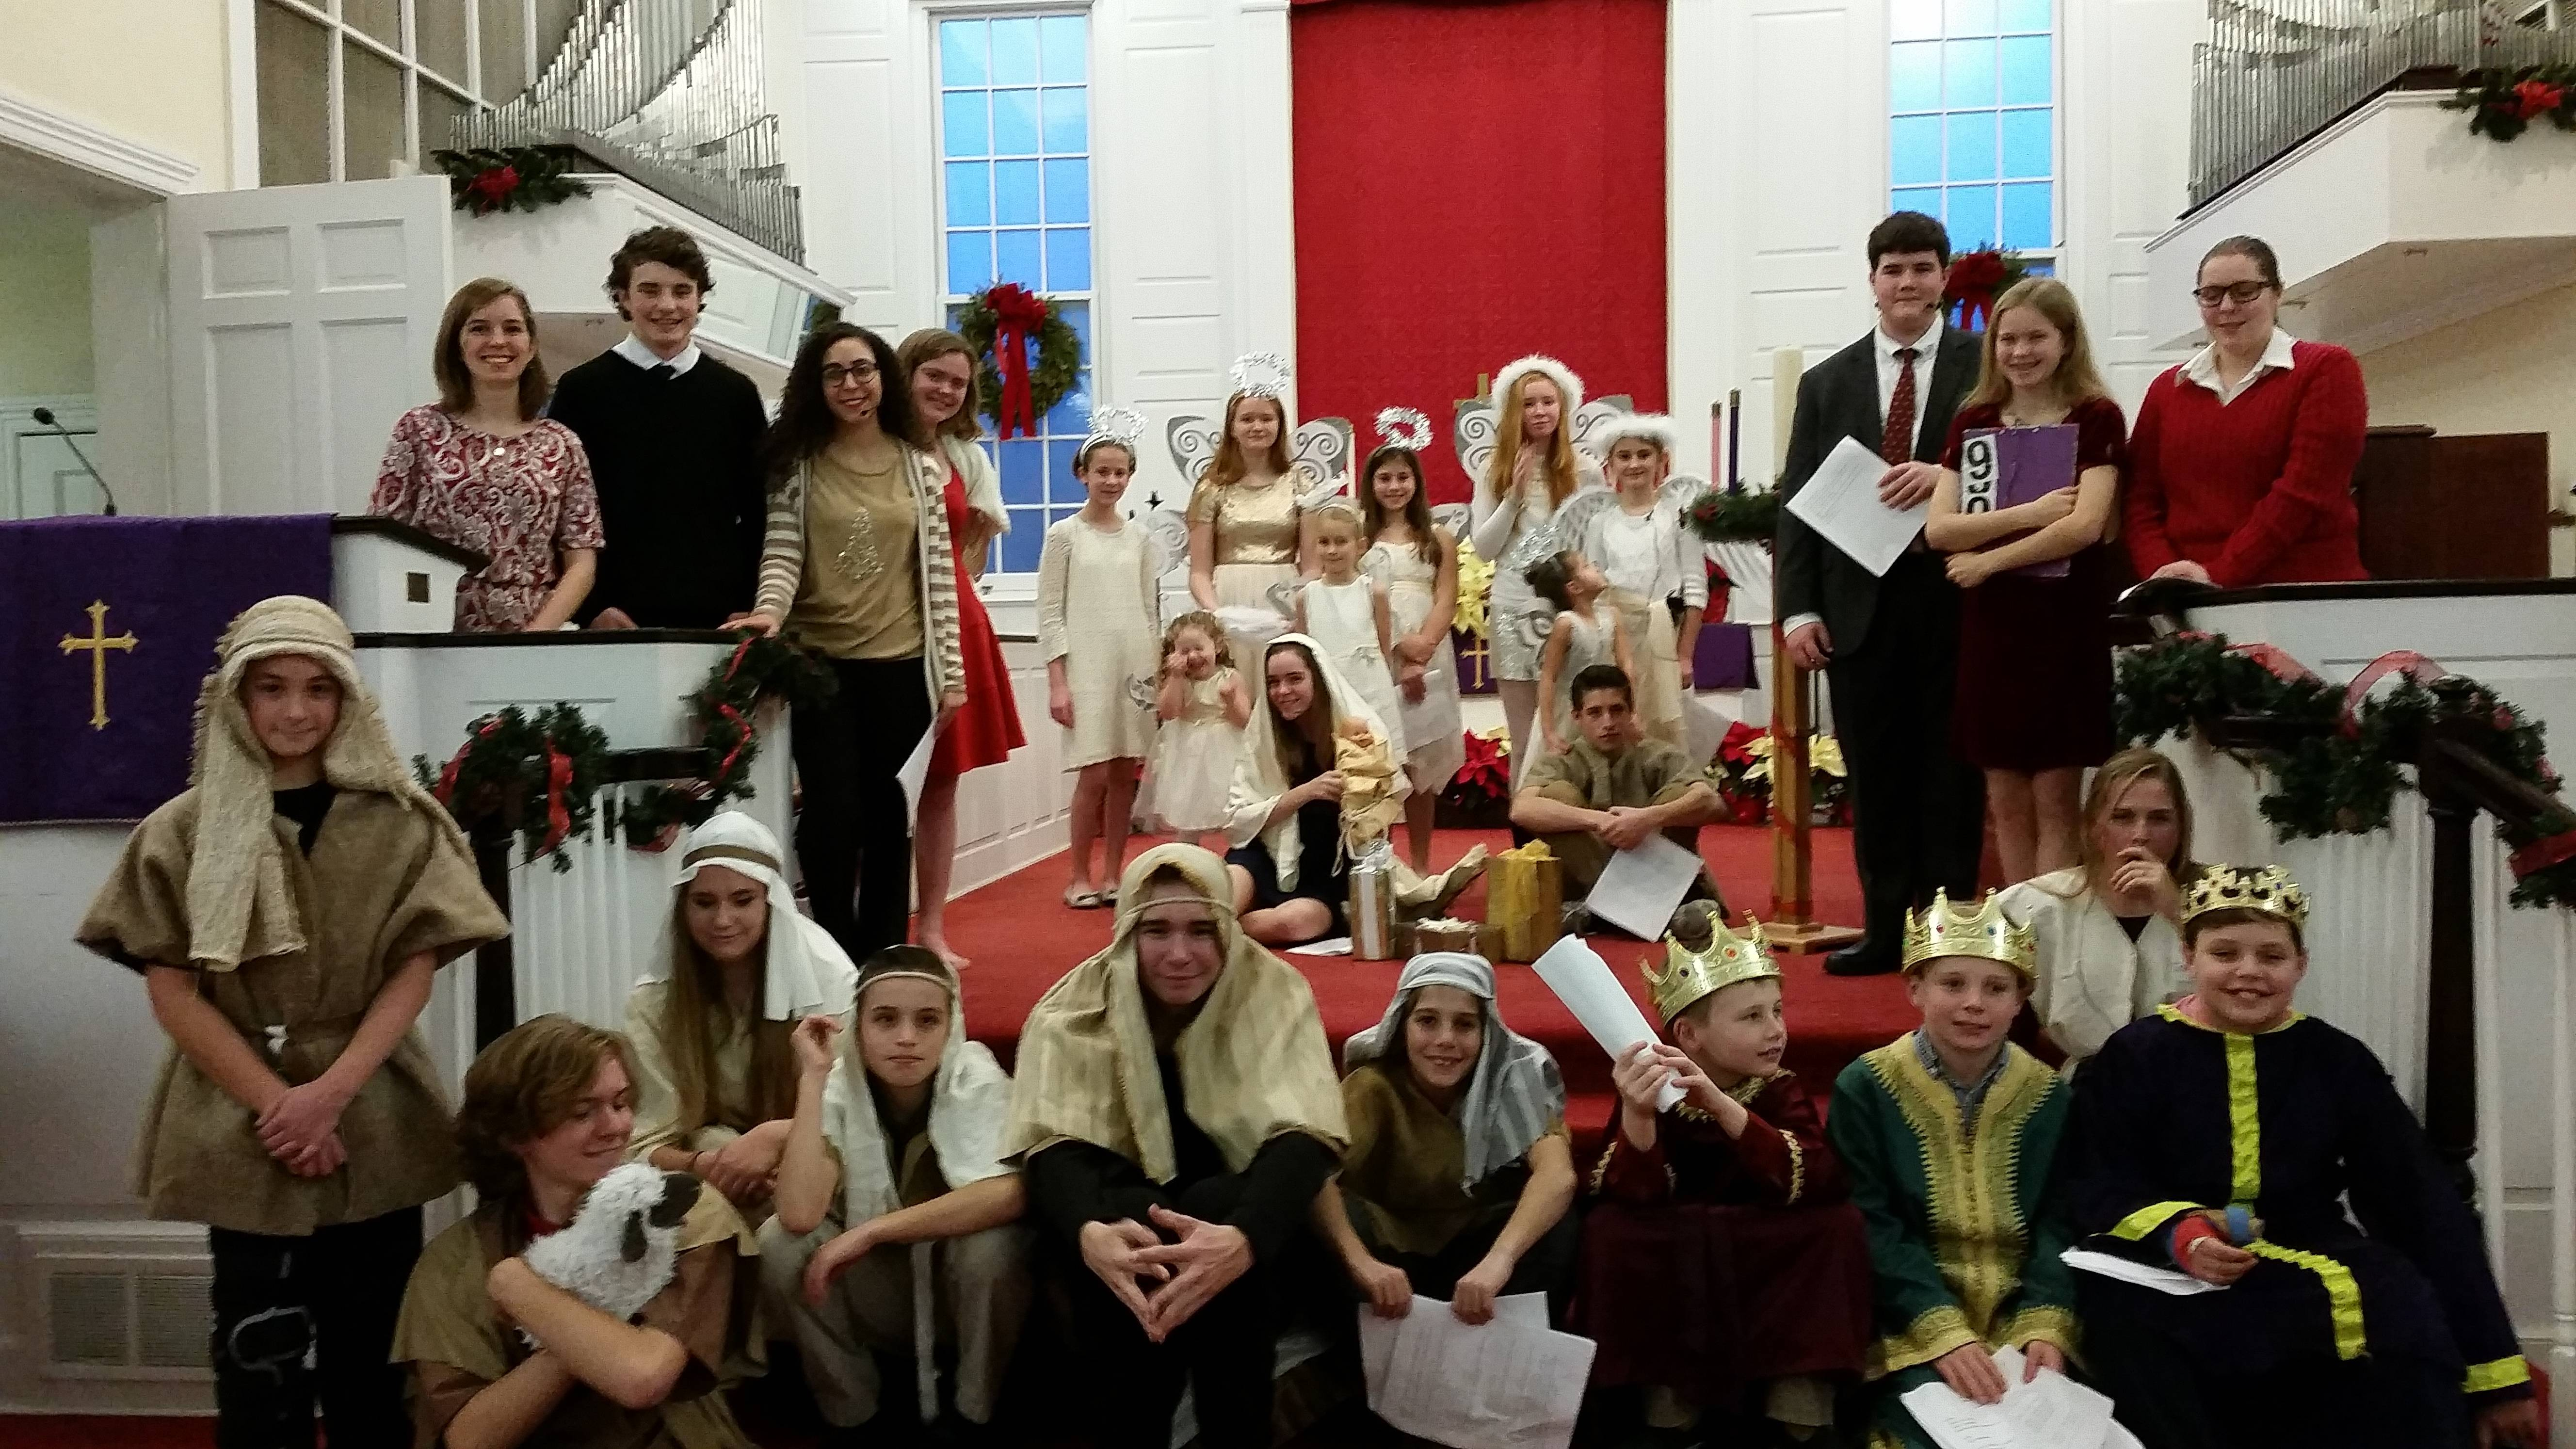 Local churches plan Christmas services